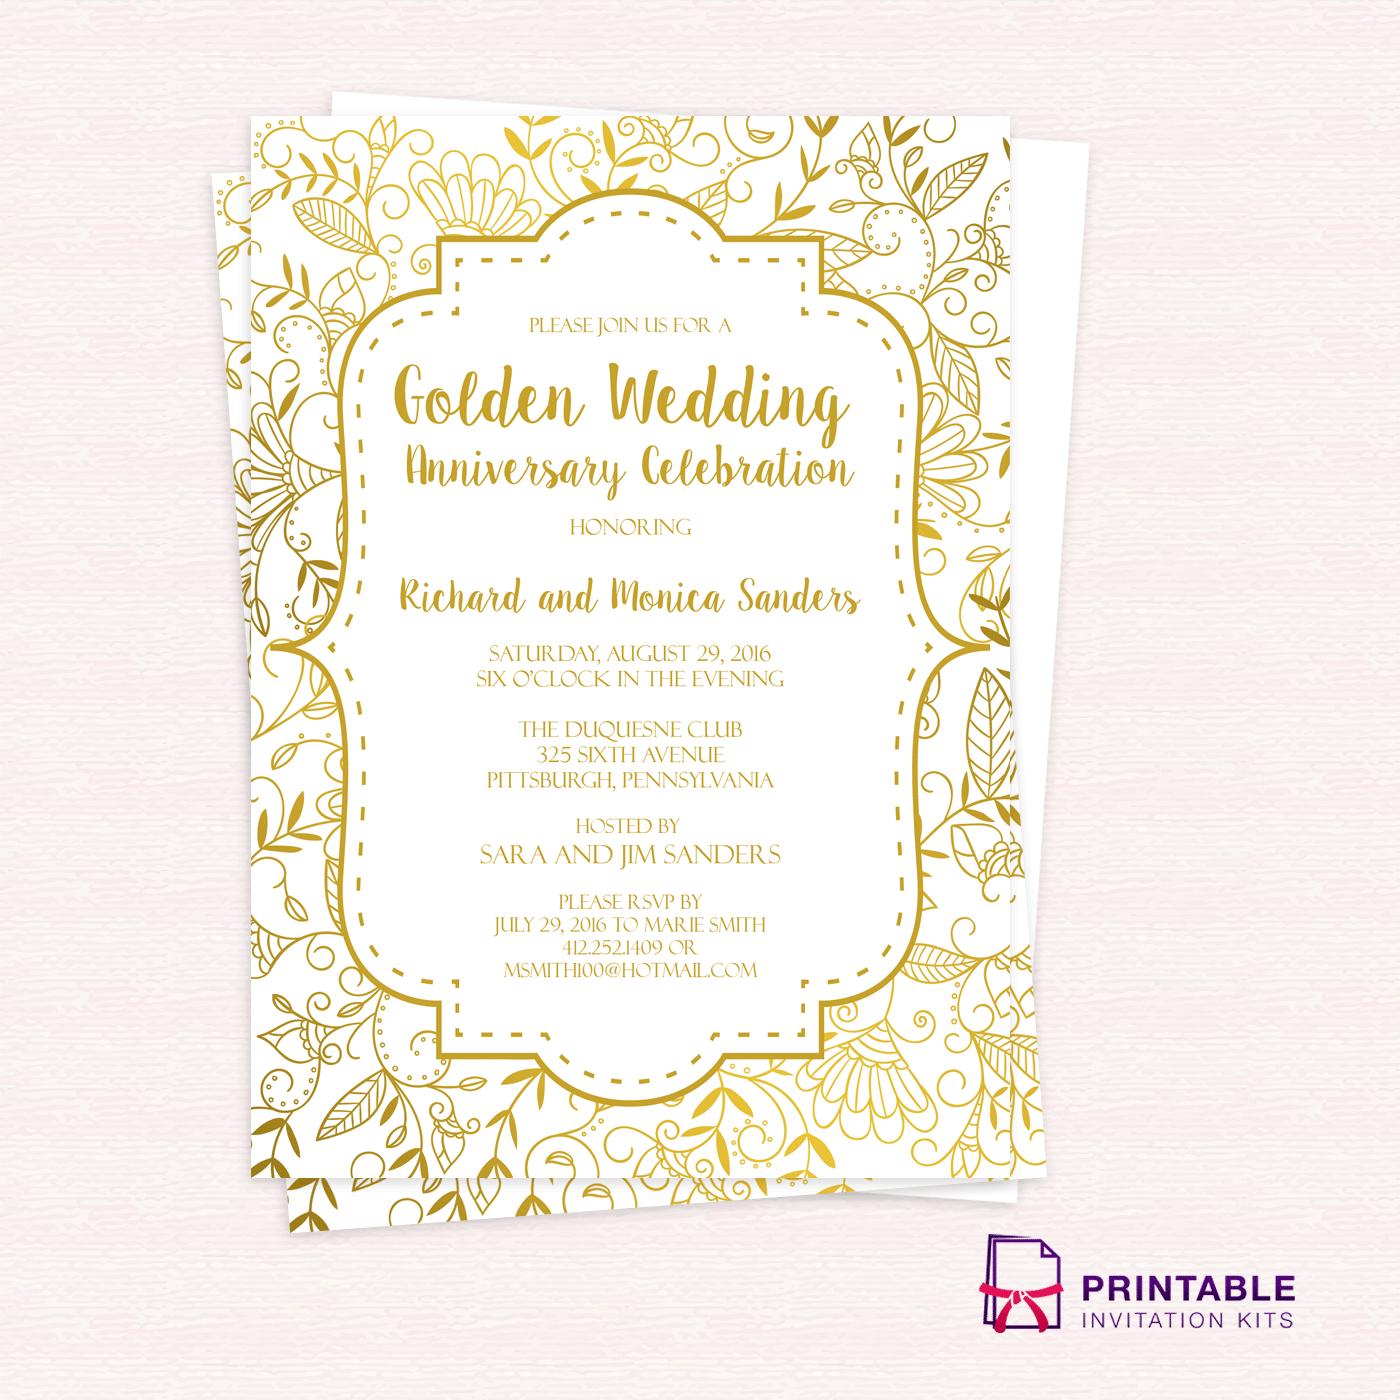 Golden Wedding Anniversary Invitation Template ← Wedding Invitation - Free Printable Wedding Invitation Kits